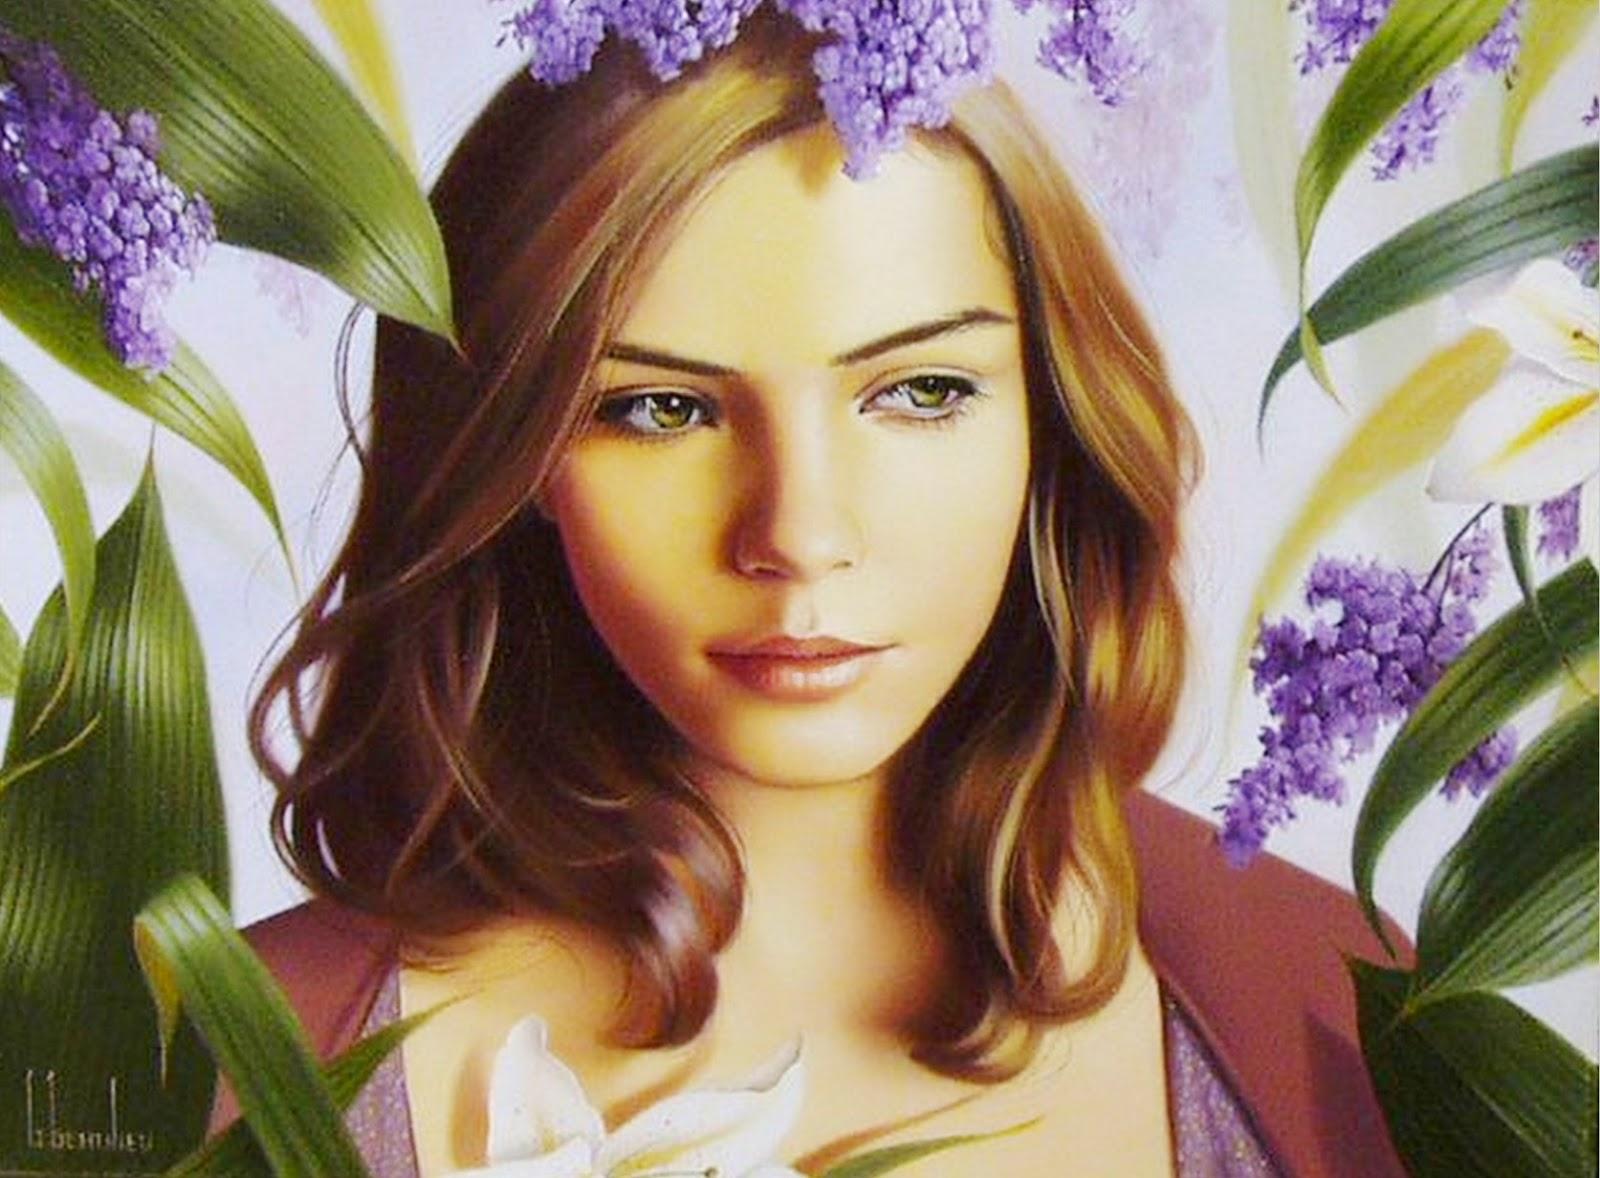 rostros-femeninos-pintados-en-oleo